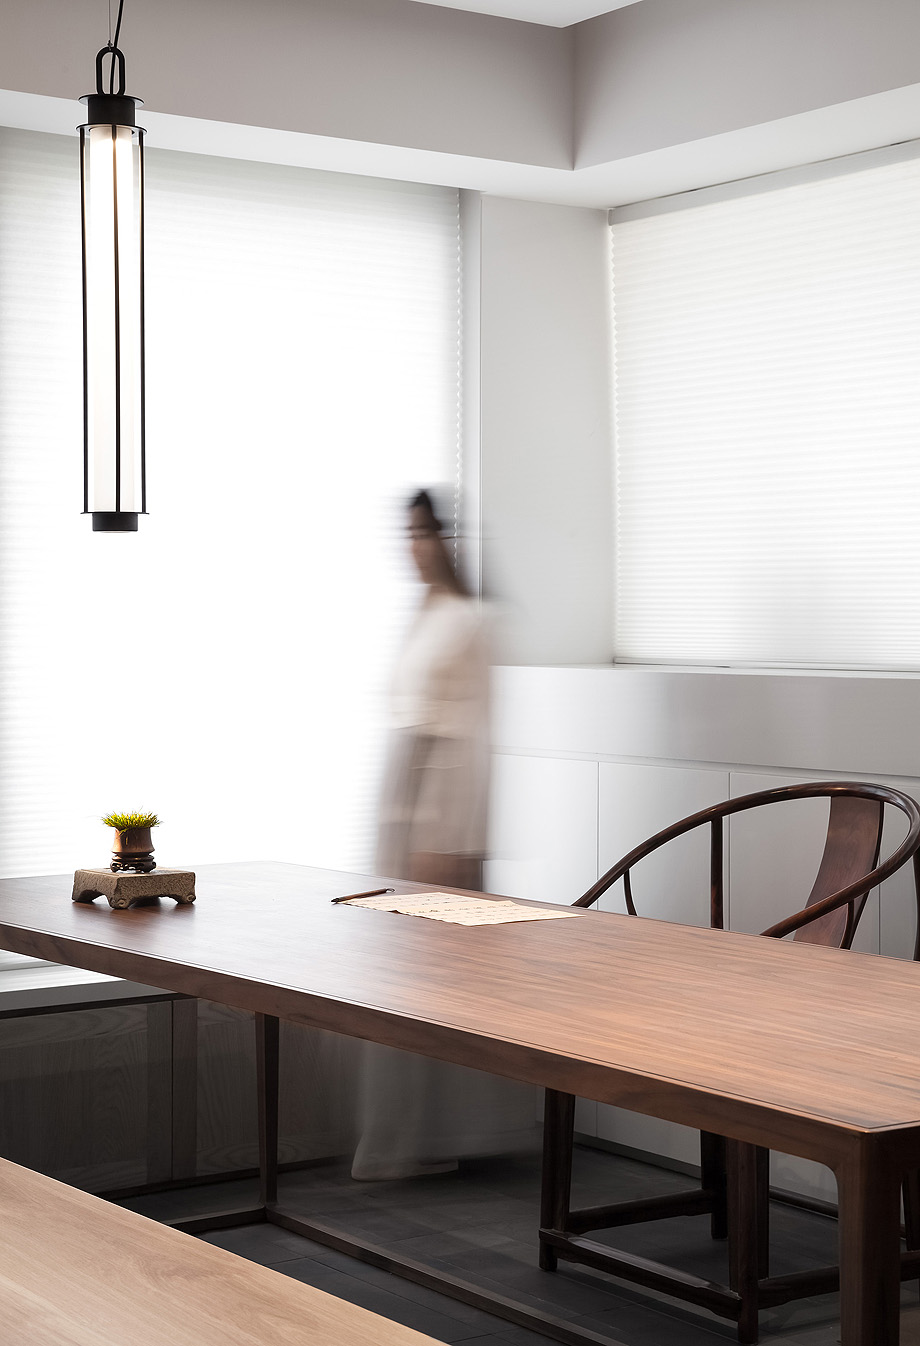 vivienda de ad architecture - foto ouyang yun (4)